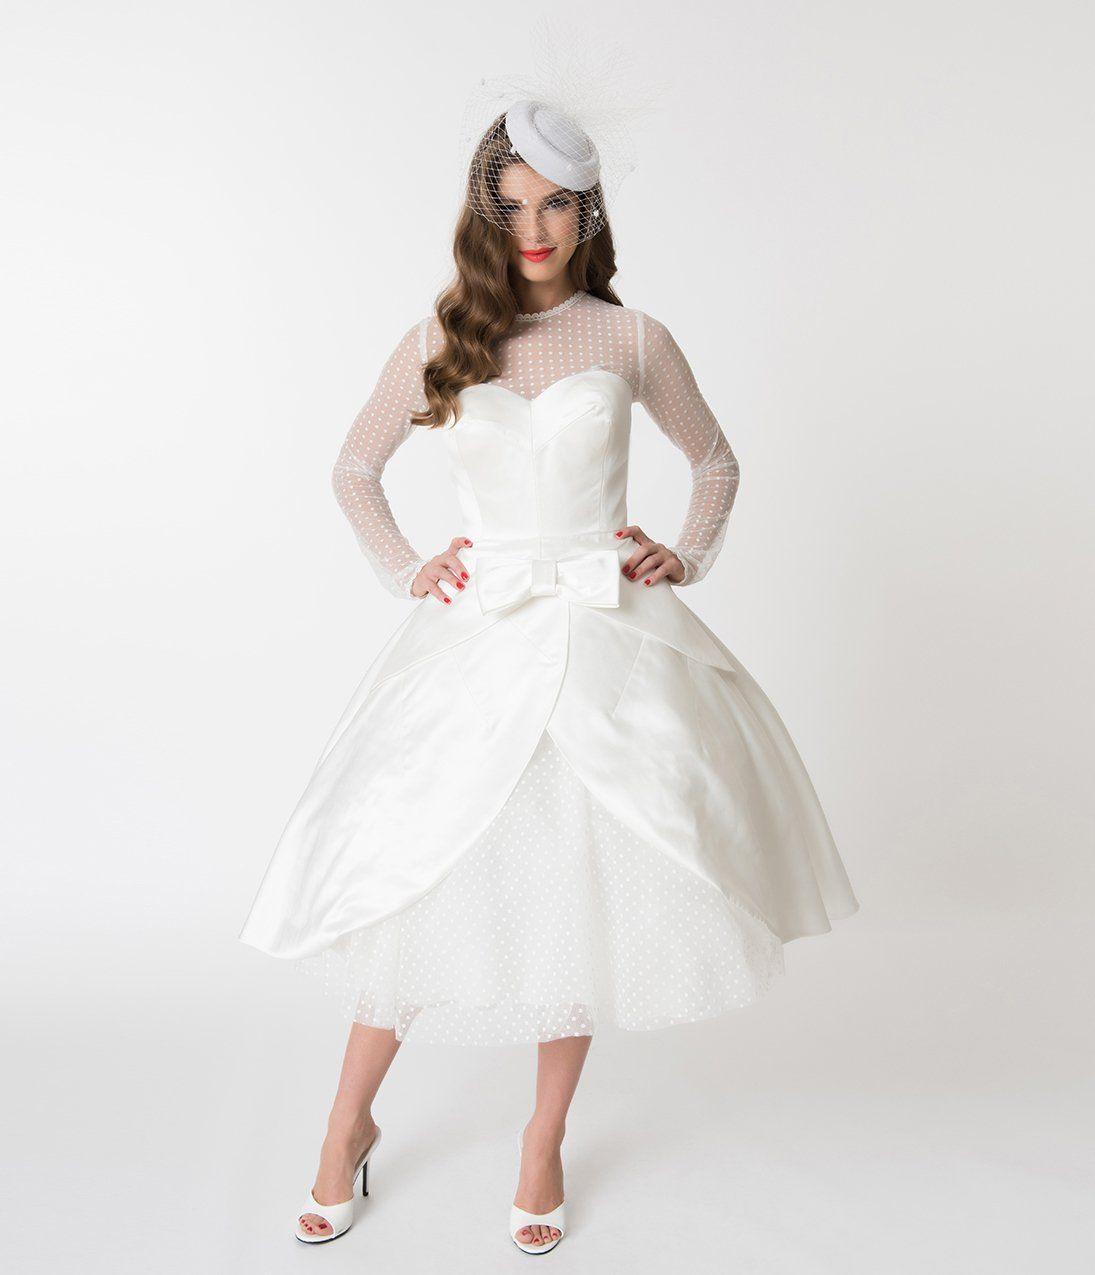 50s Wedding Dress 1950s Style Wedding Dresses Rockabilly Weddings Barbie X Unique Vintage Ivory Be Wedding Dresses Unique Wedding Dress Styles Bridal Dresses